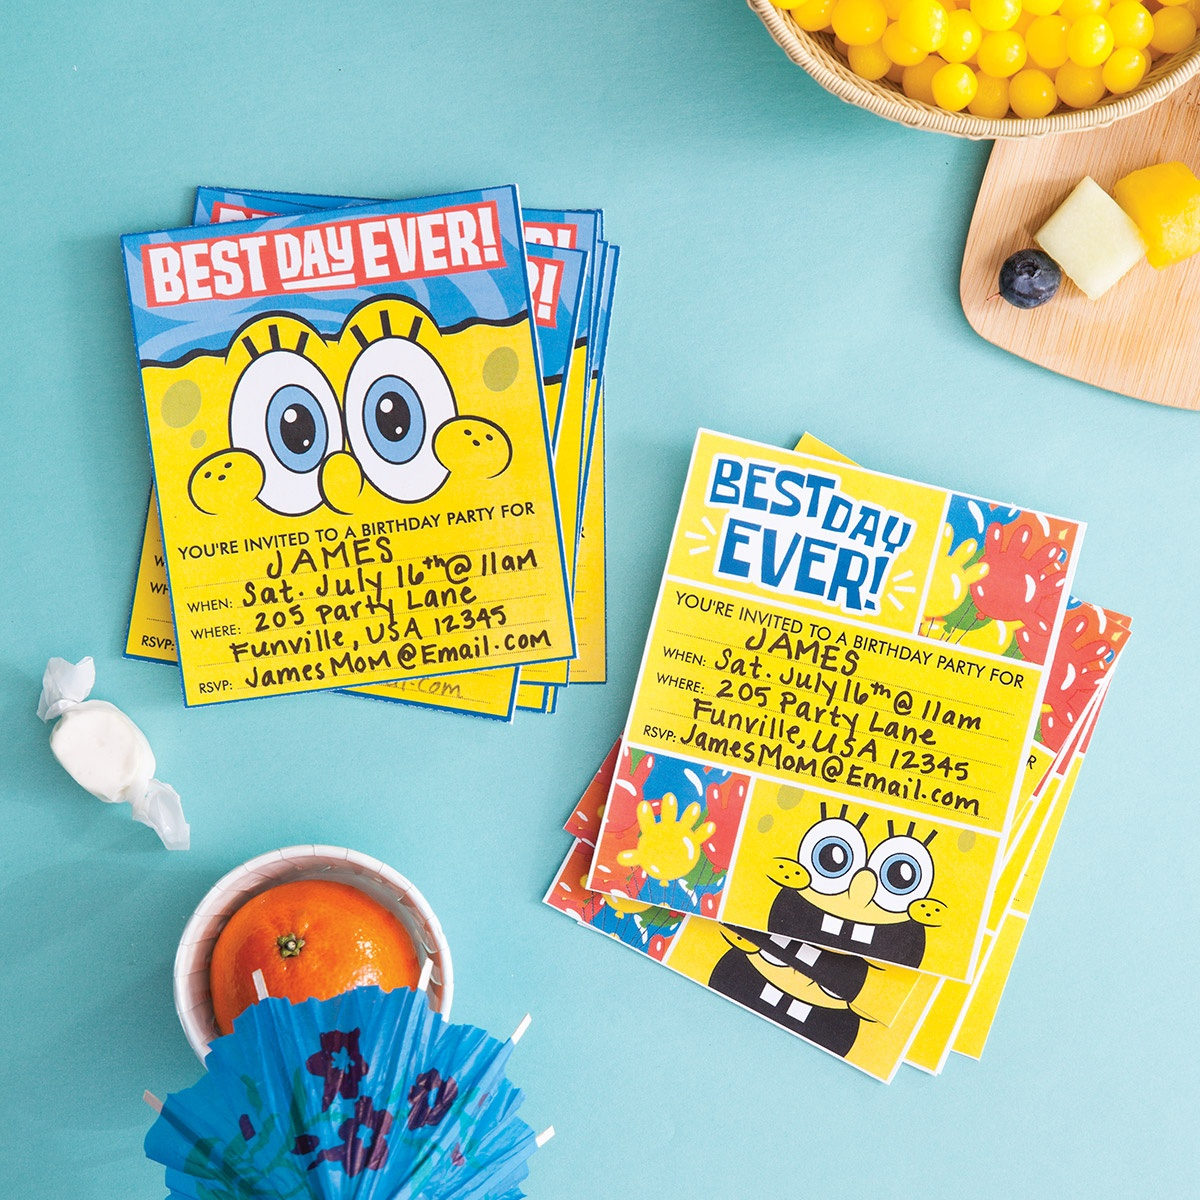 Plan A Spongebob Squarepants Party | Nickelodeon Parents - Spongebob Free Printable Invitations